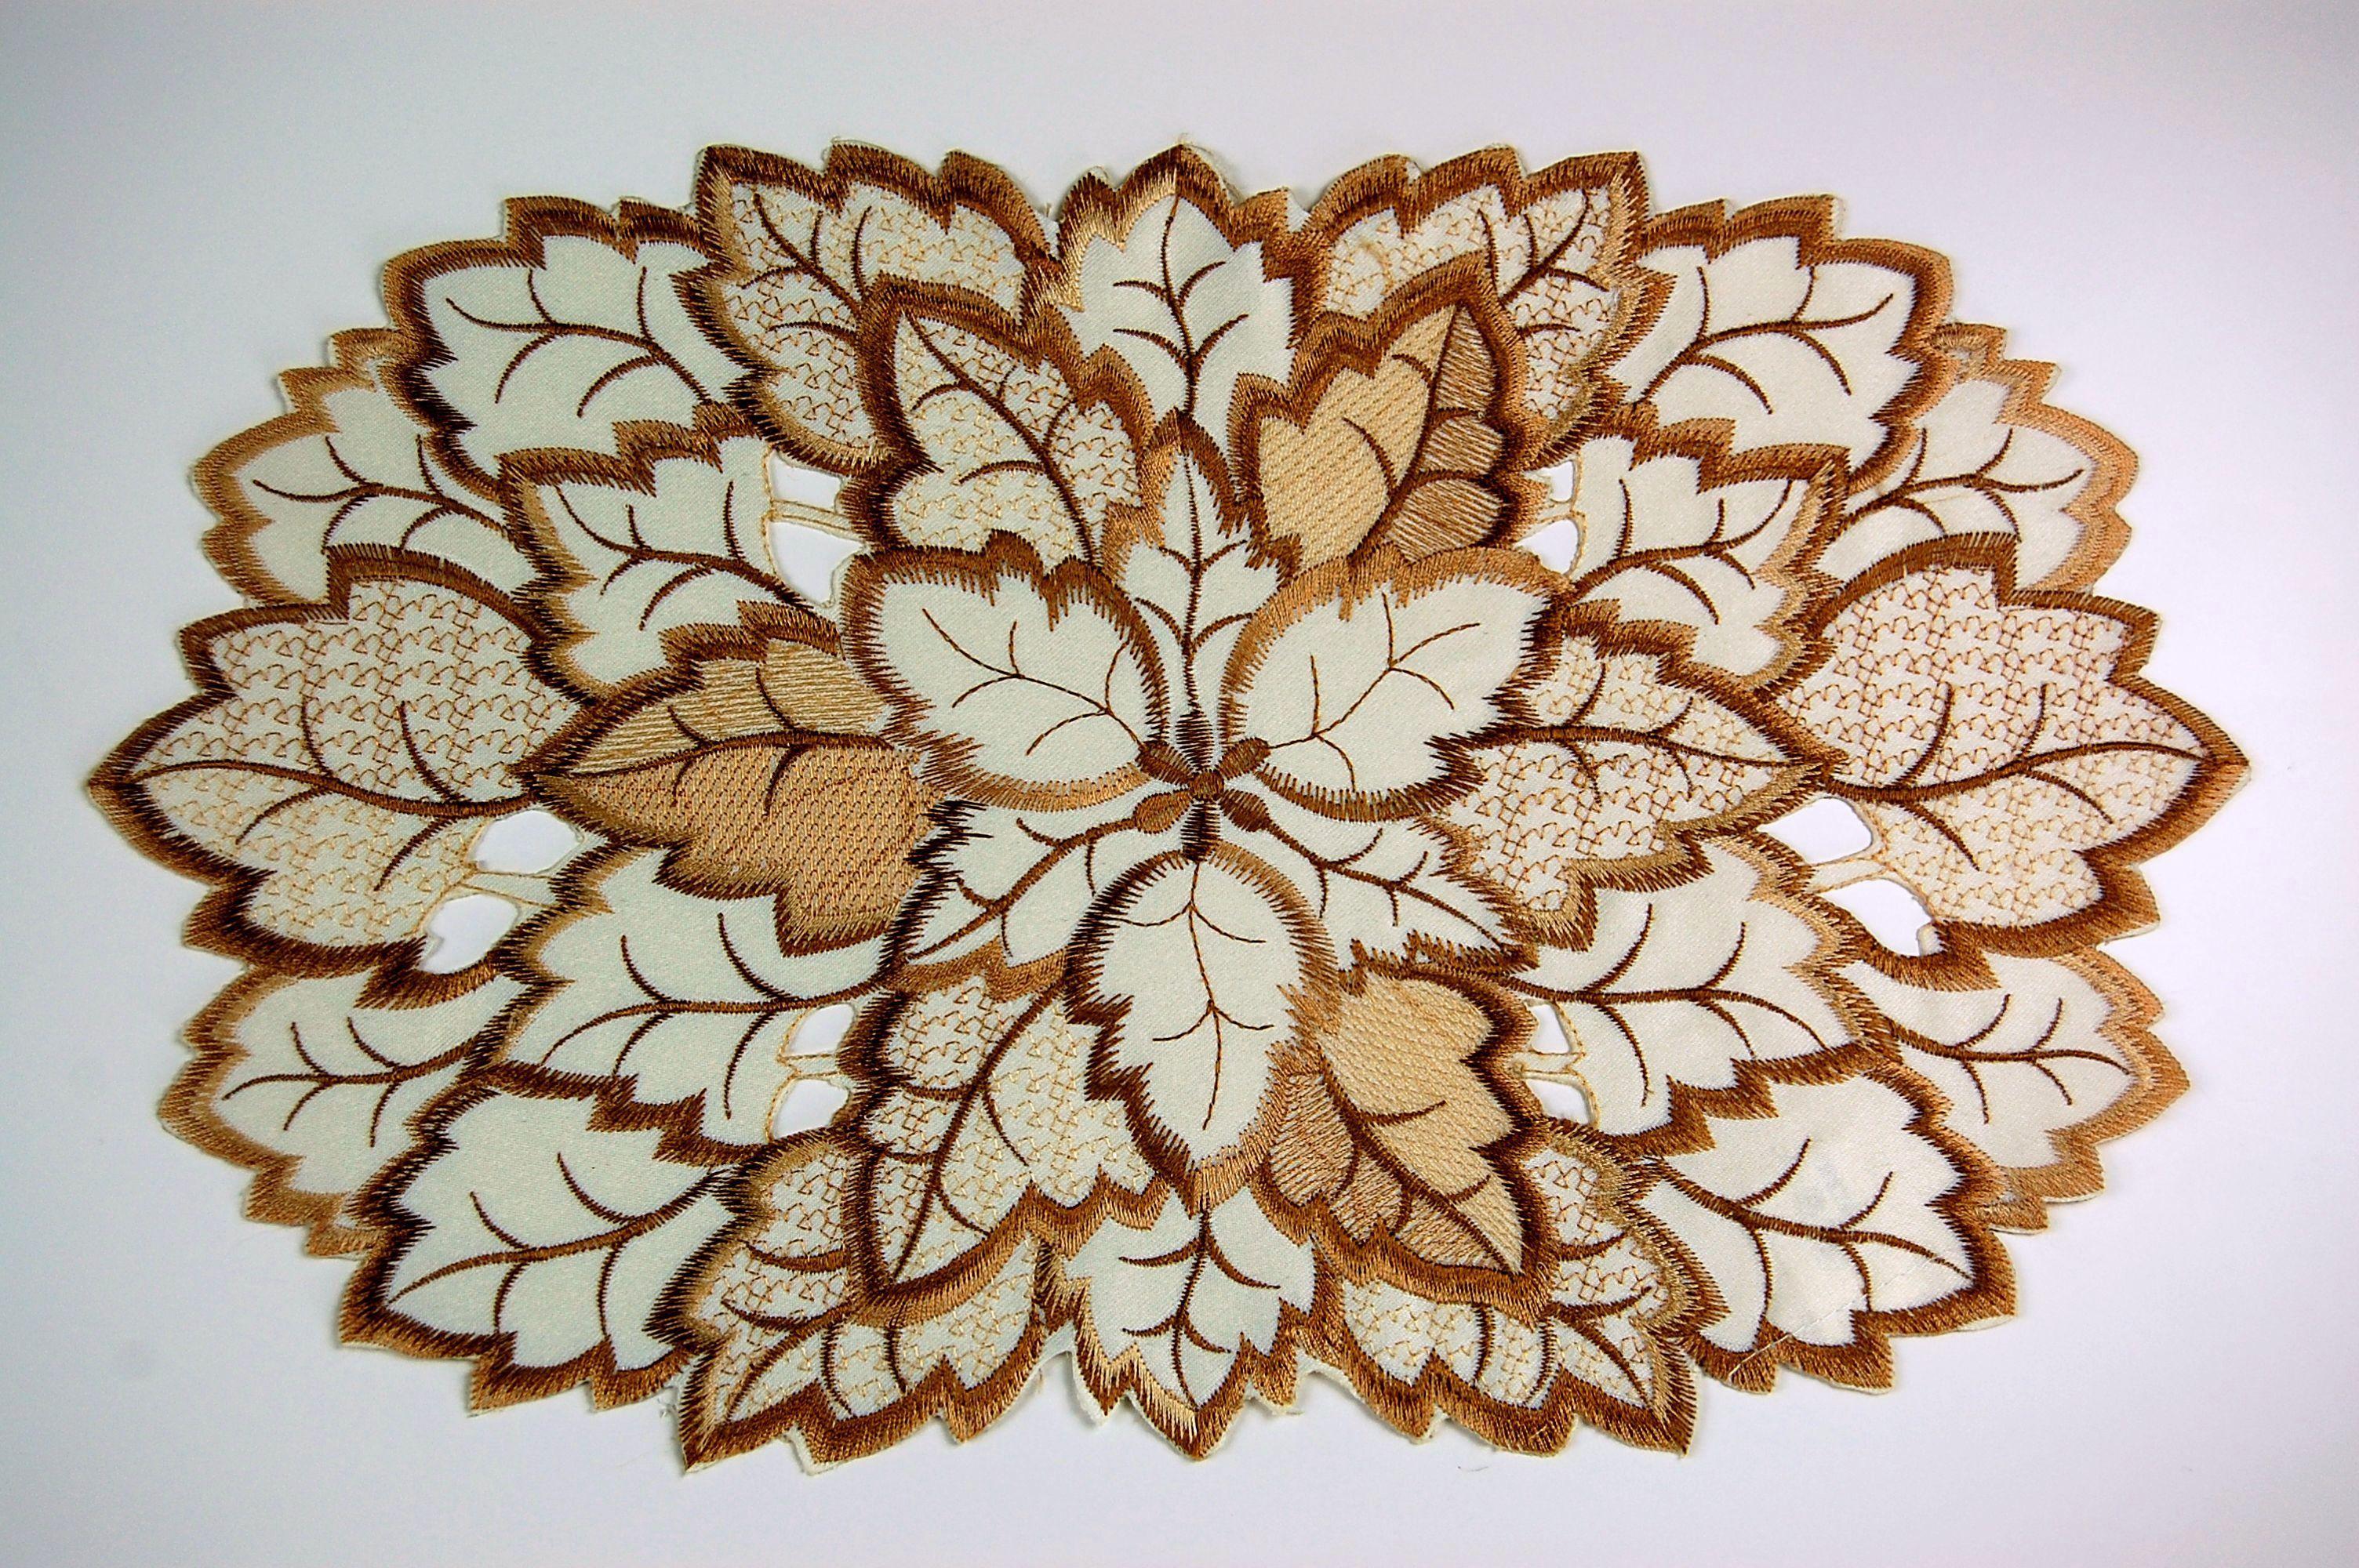 tischdecke beige bl tter blatt braun gestickt herbst. Black Bedroom Furniture Sets. Home Design Ideas